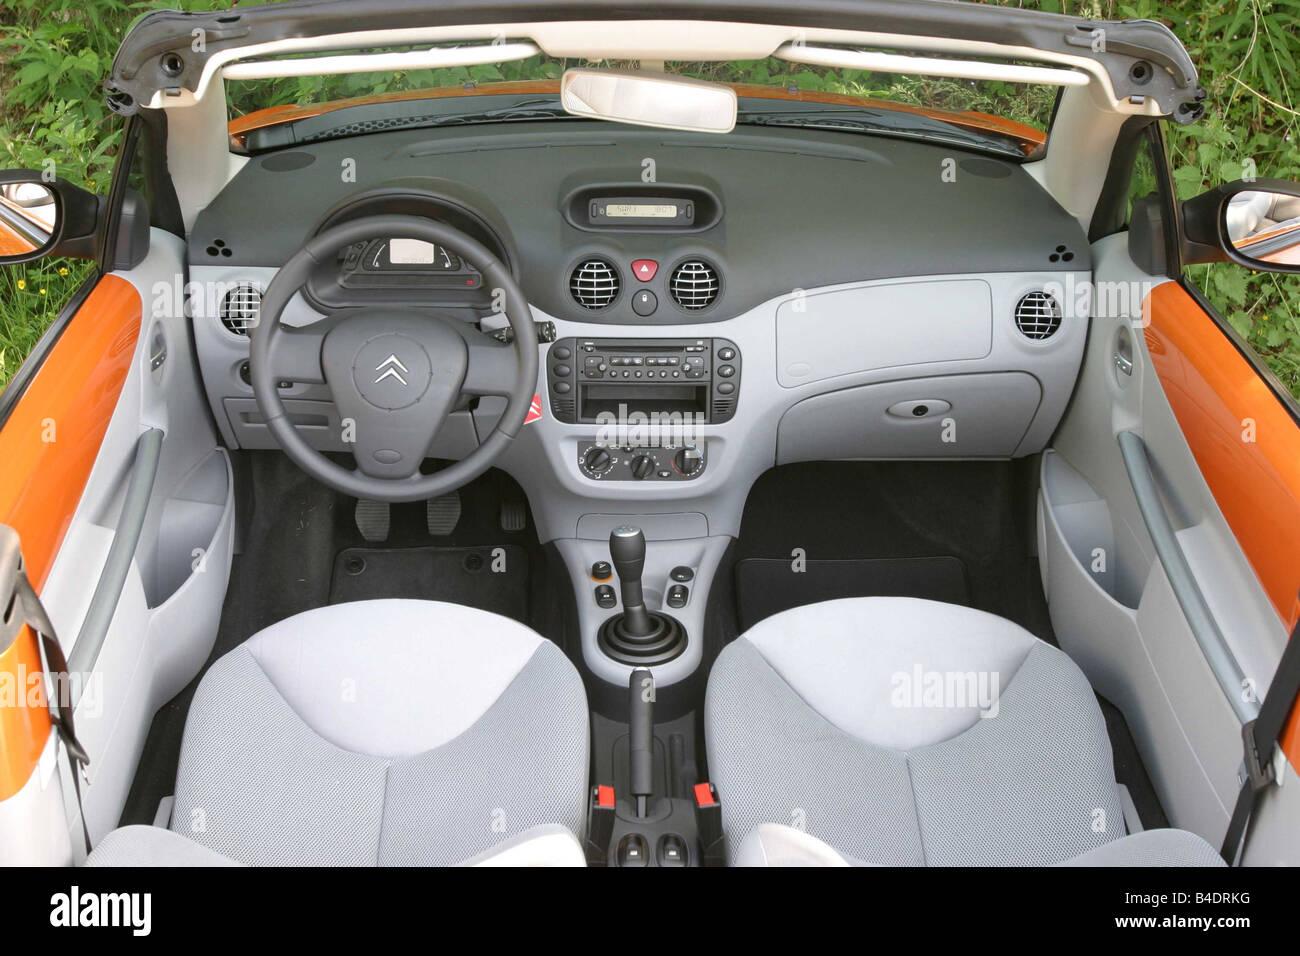 Citroen C3 Pluriel 1 4 Stock Photos & Citroen C3 Pluriel 1 4 Stock